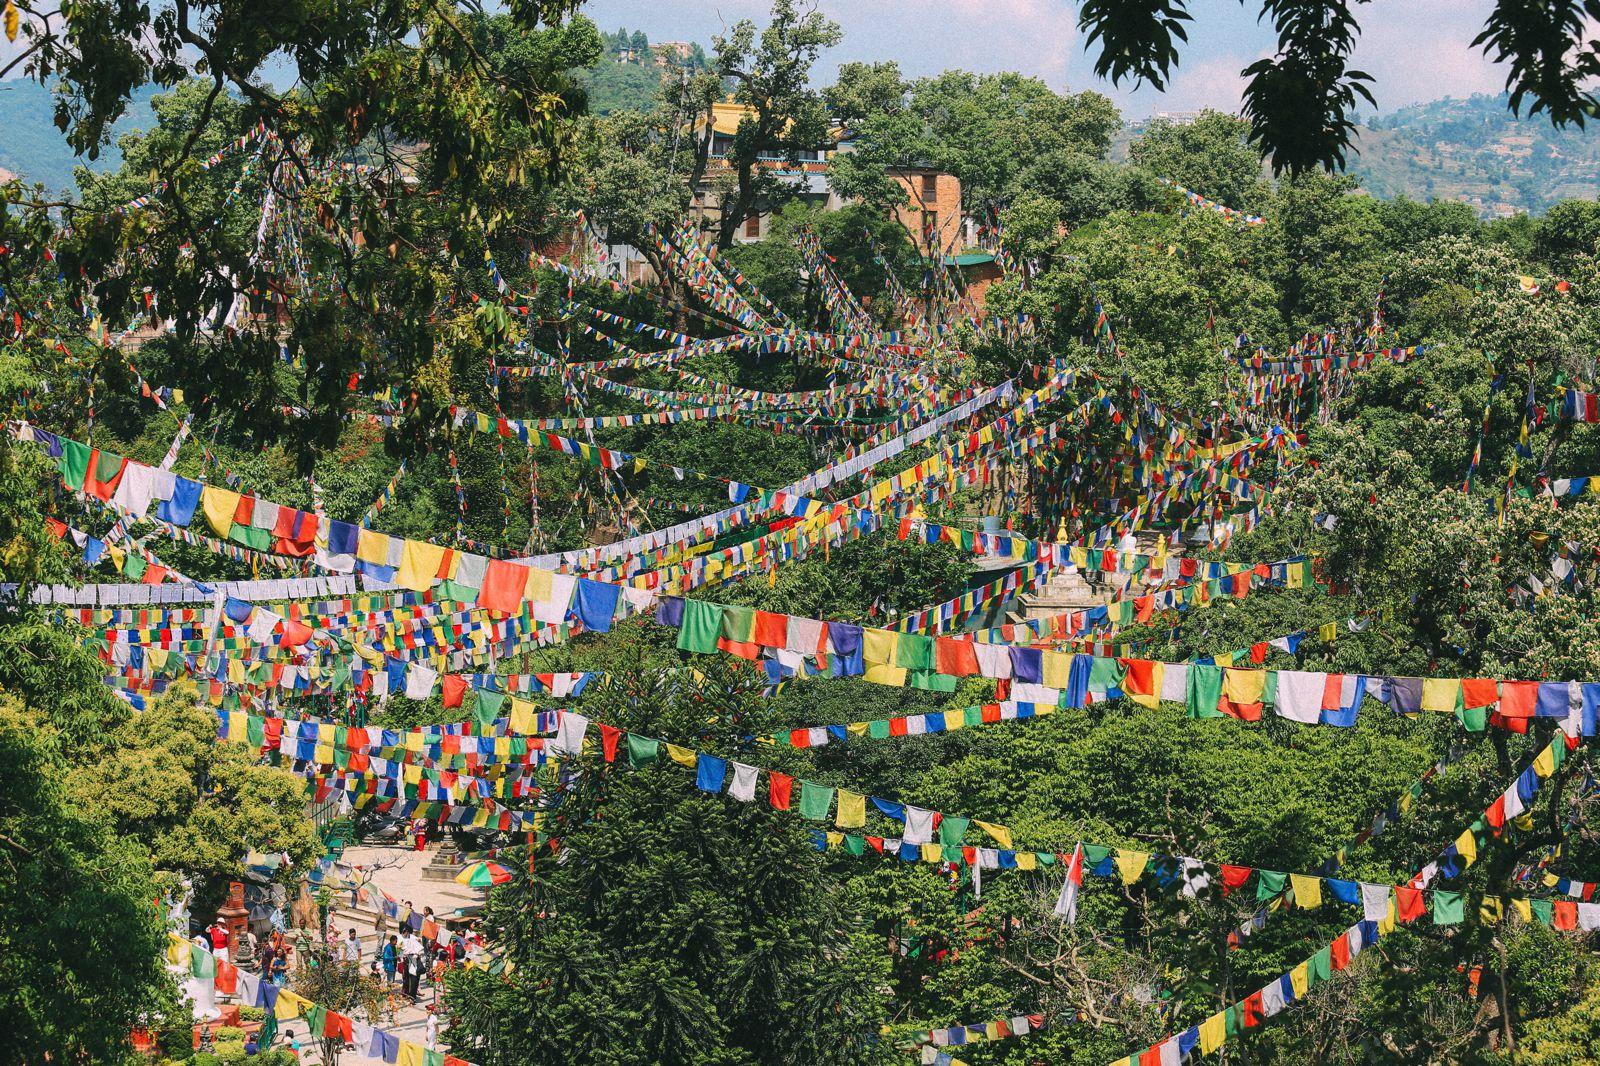 Exploring Swayambhunath Stupa - The Monkey Temple In Kathmandu, Nepal (43)